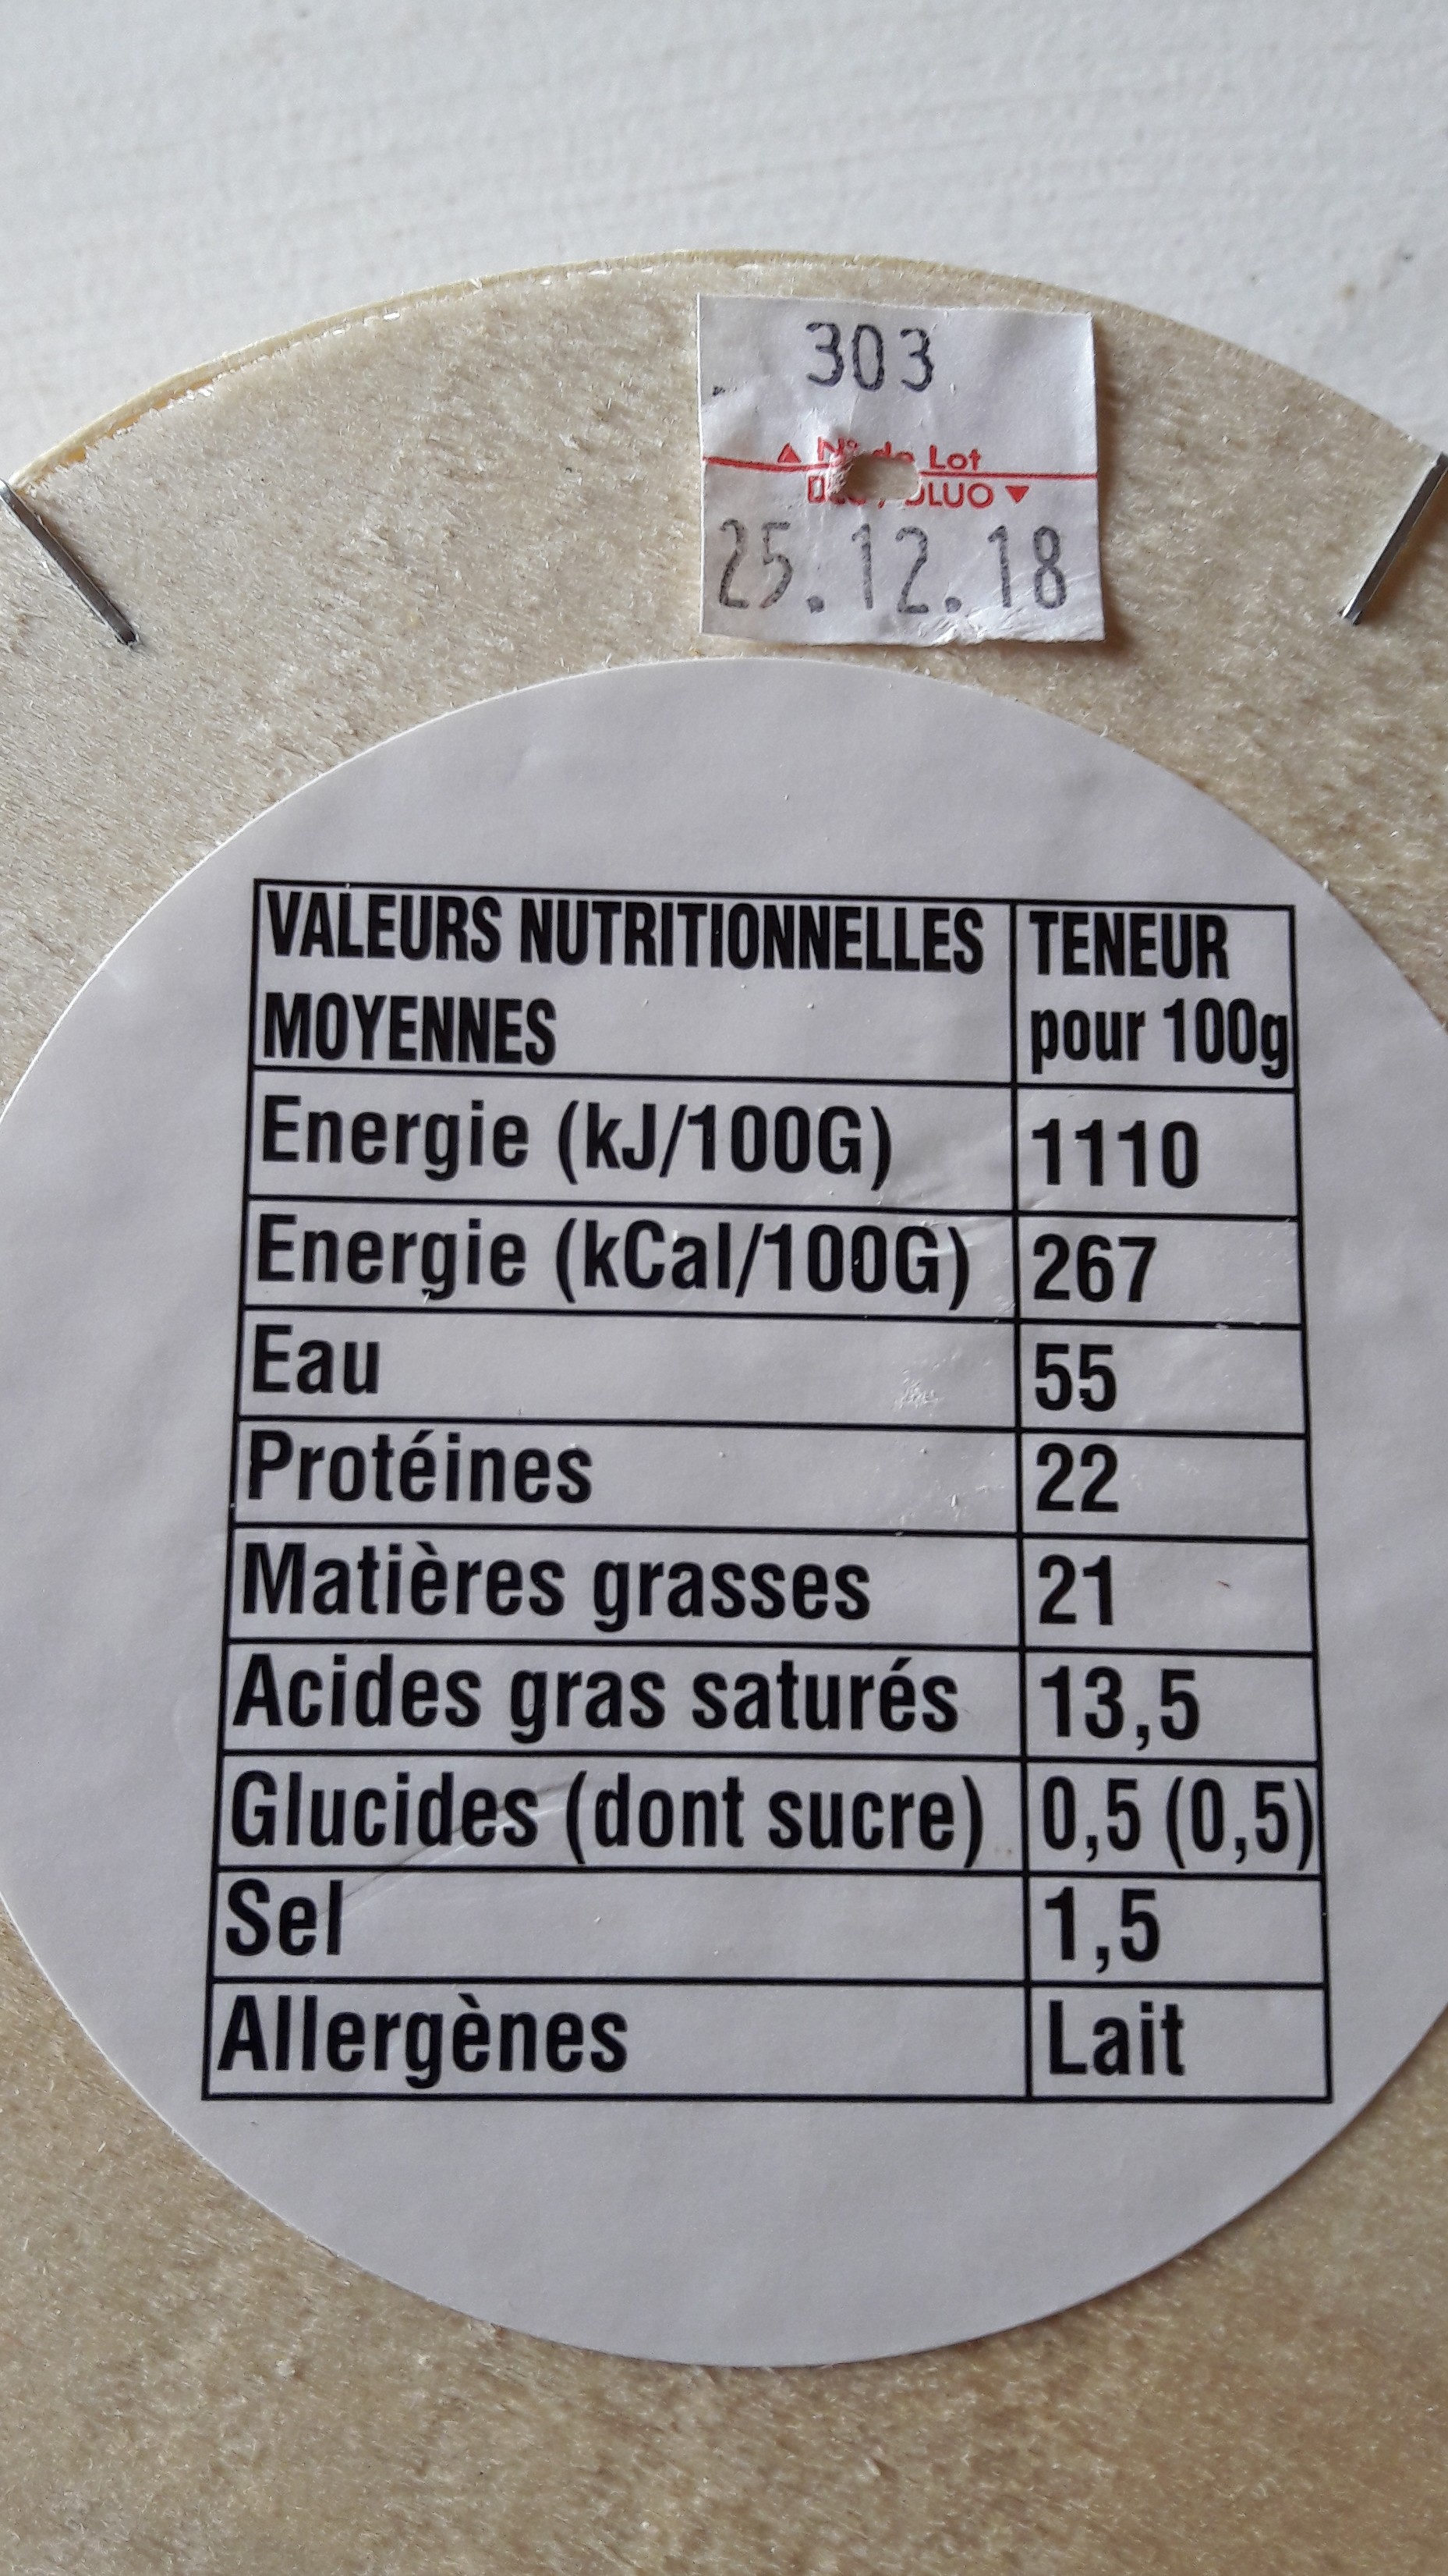 Camembert de Normandie Pre Saint Jean - Ingredients - fr